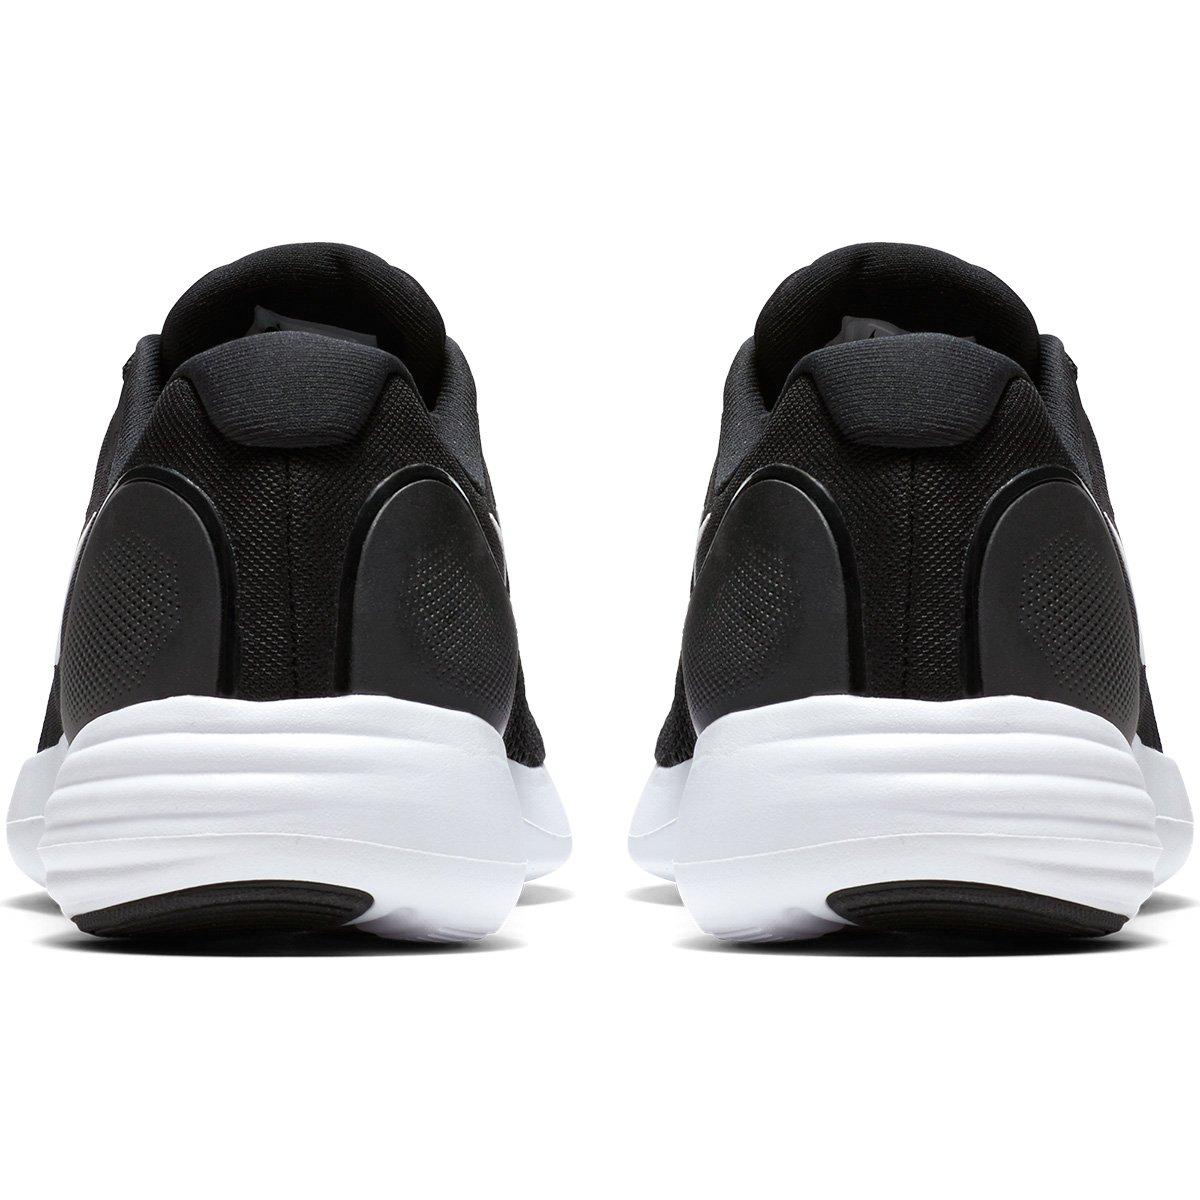 Tênis Nike Lunar Apparent Masculino  Tênis Nike Lunar Apparent Masculino ... 547a4987f3a32